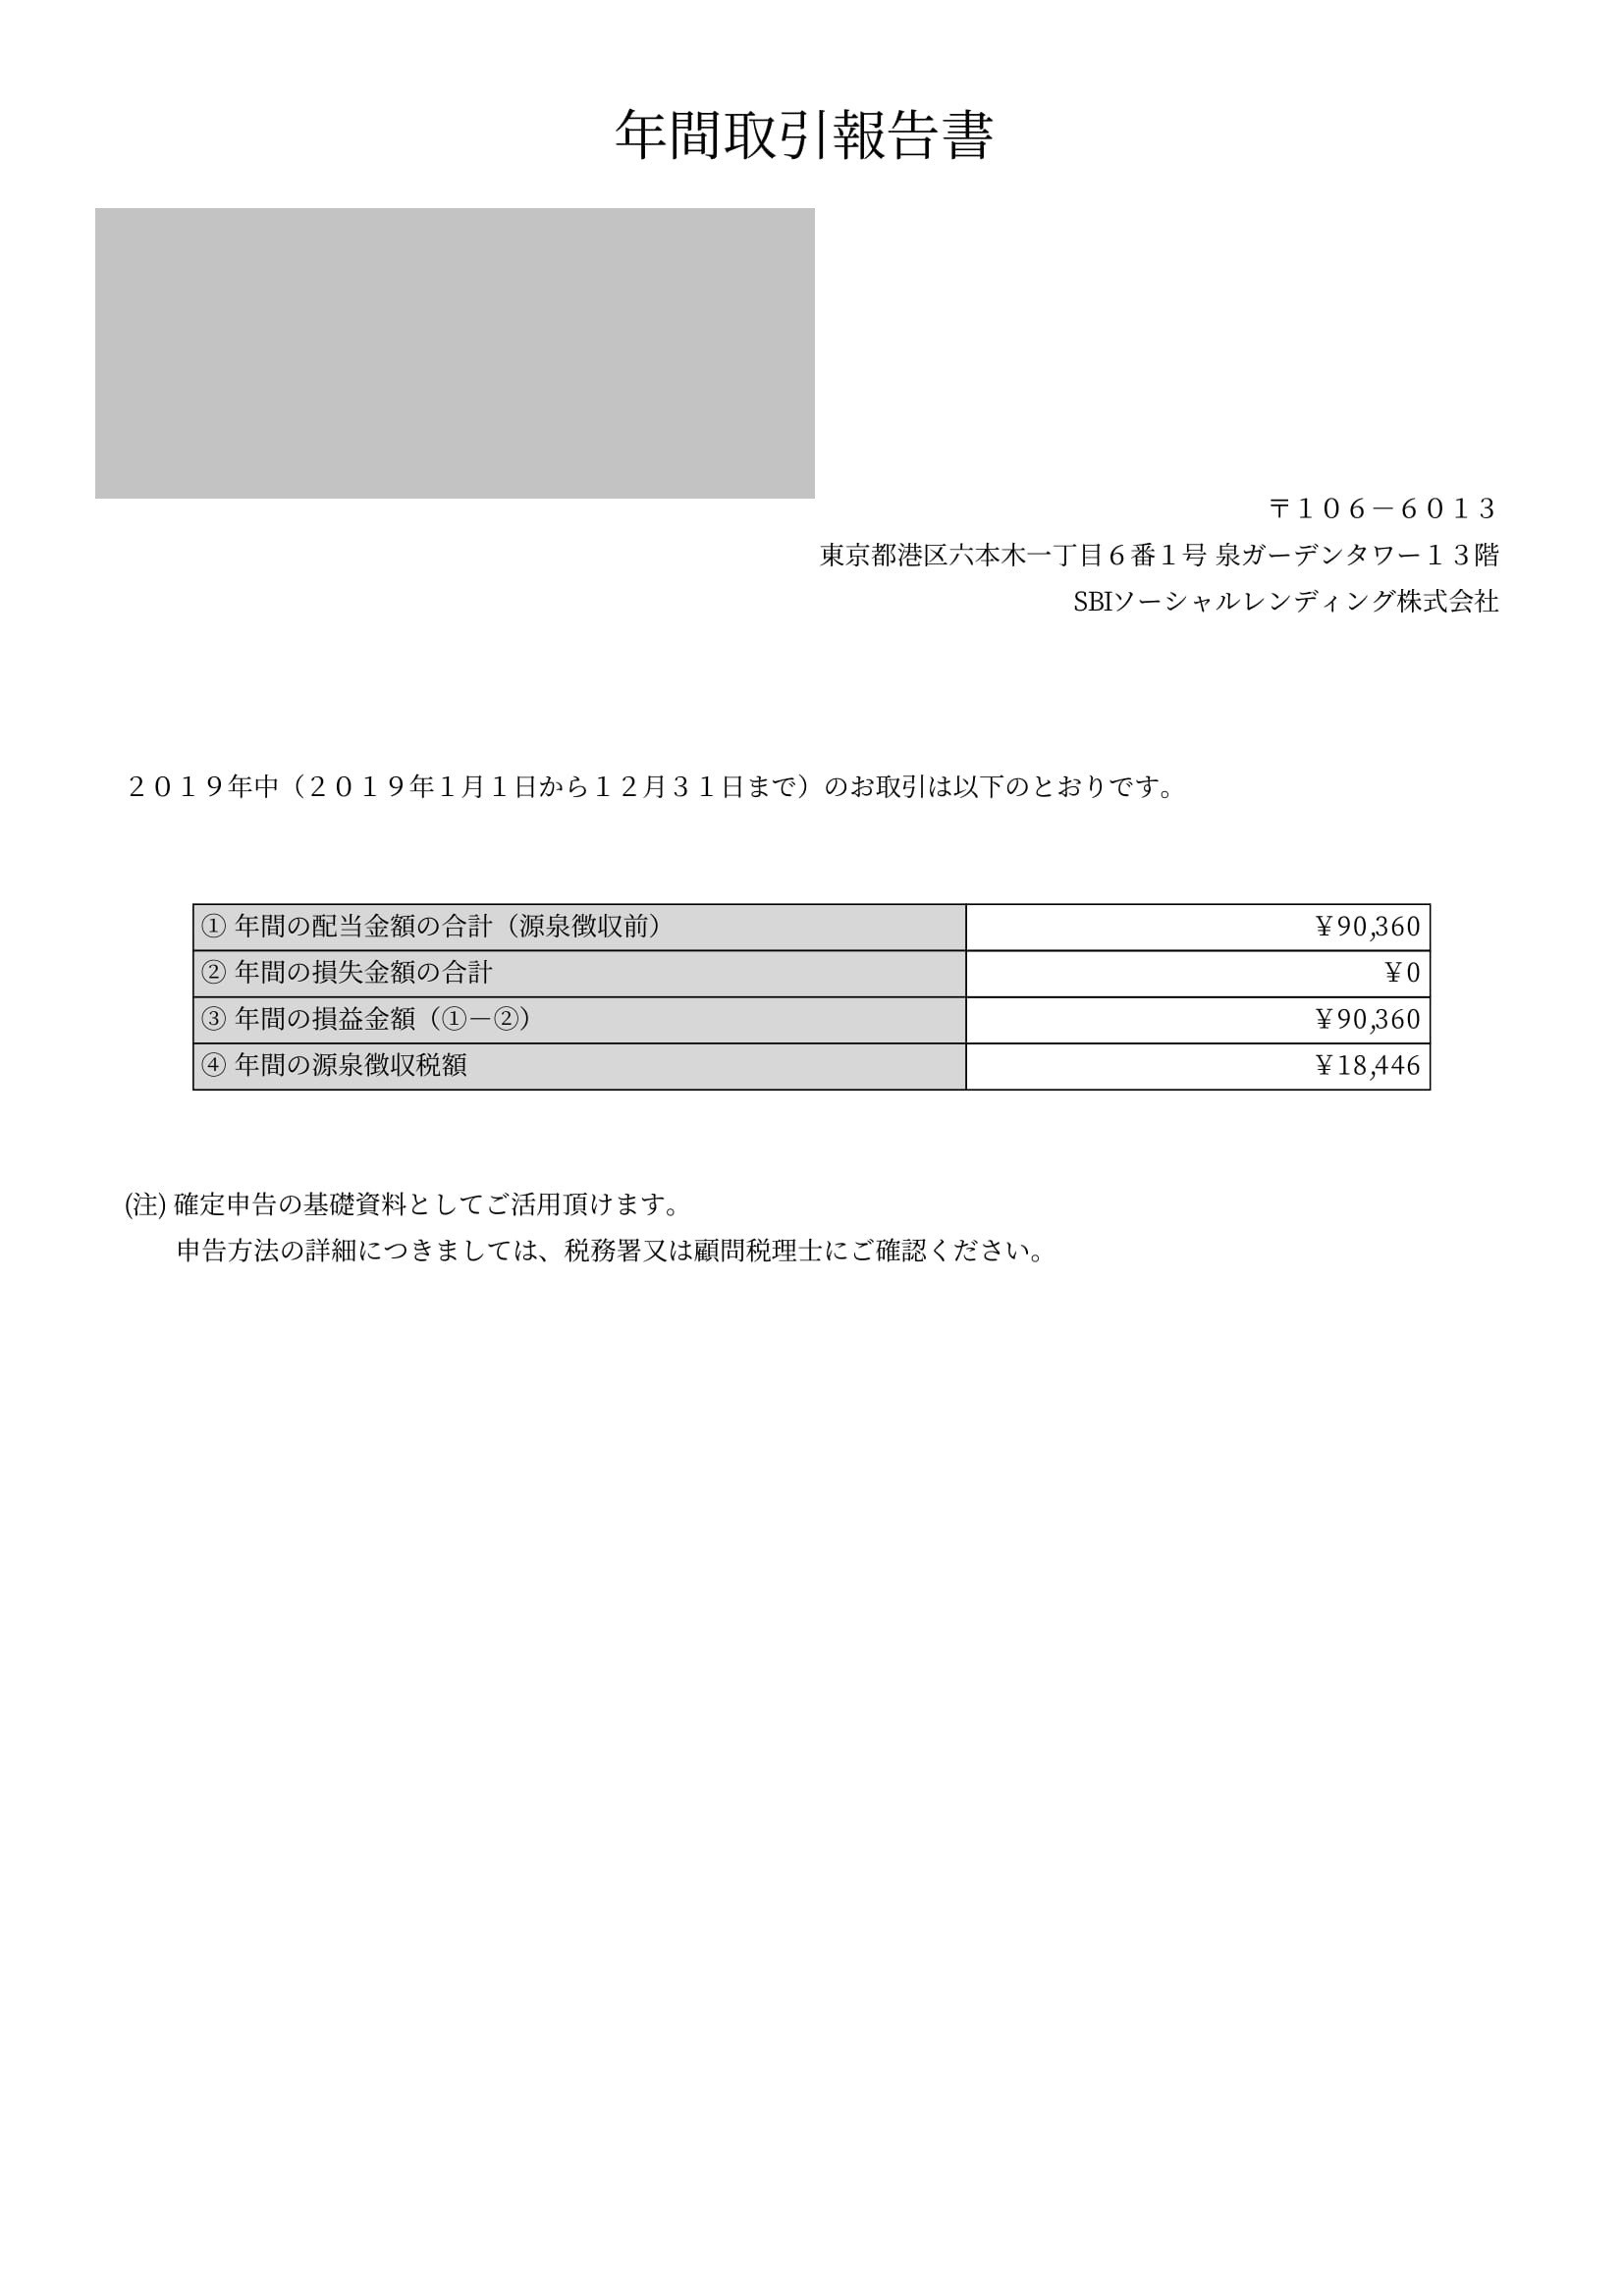 SBI年間取引報告書 (4)-1